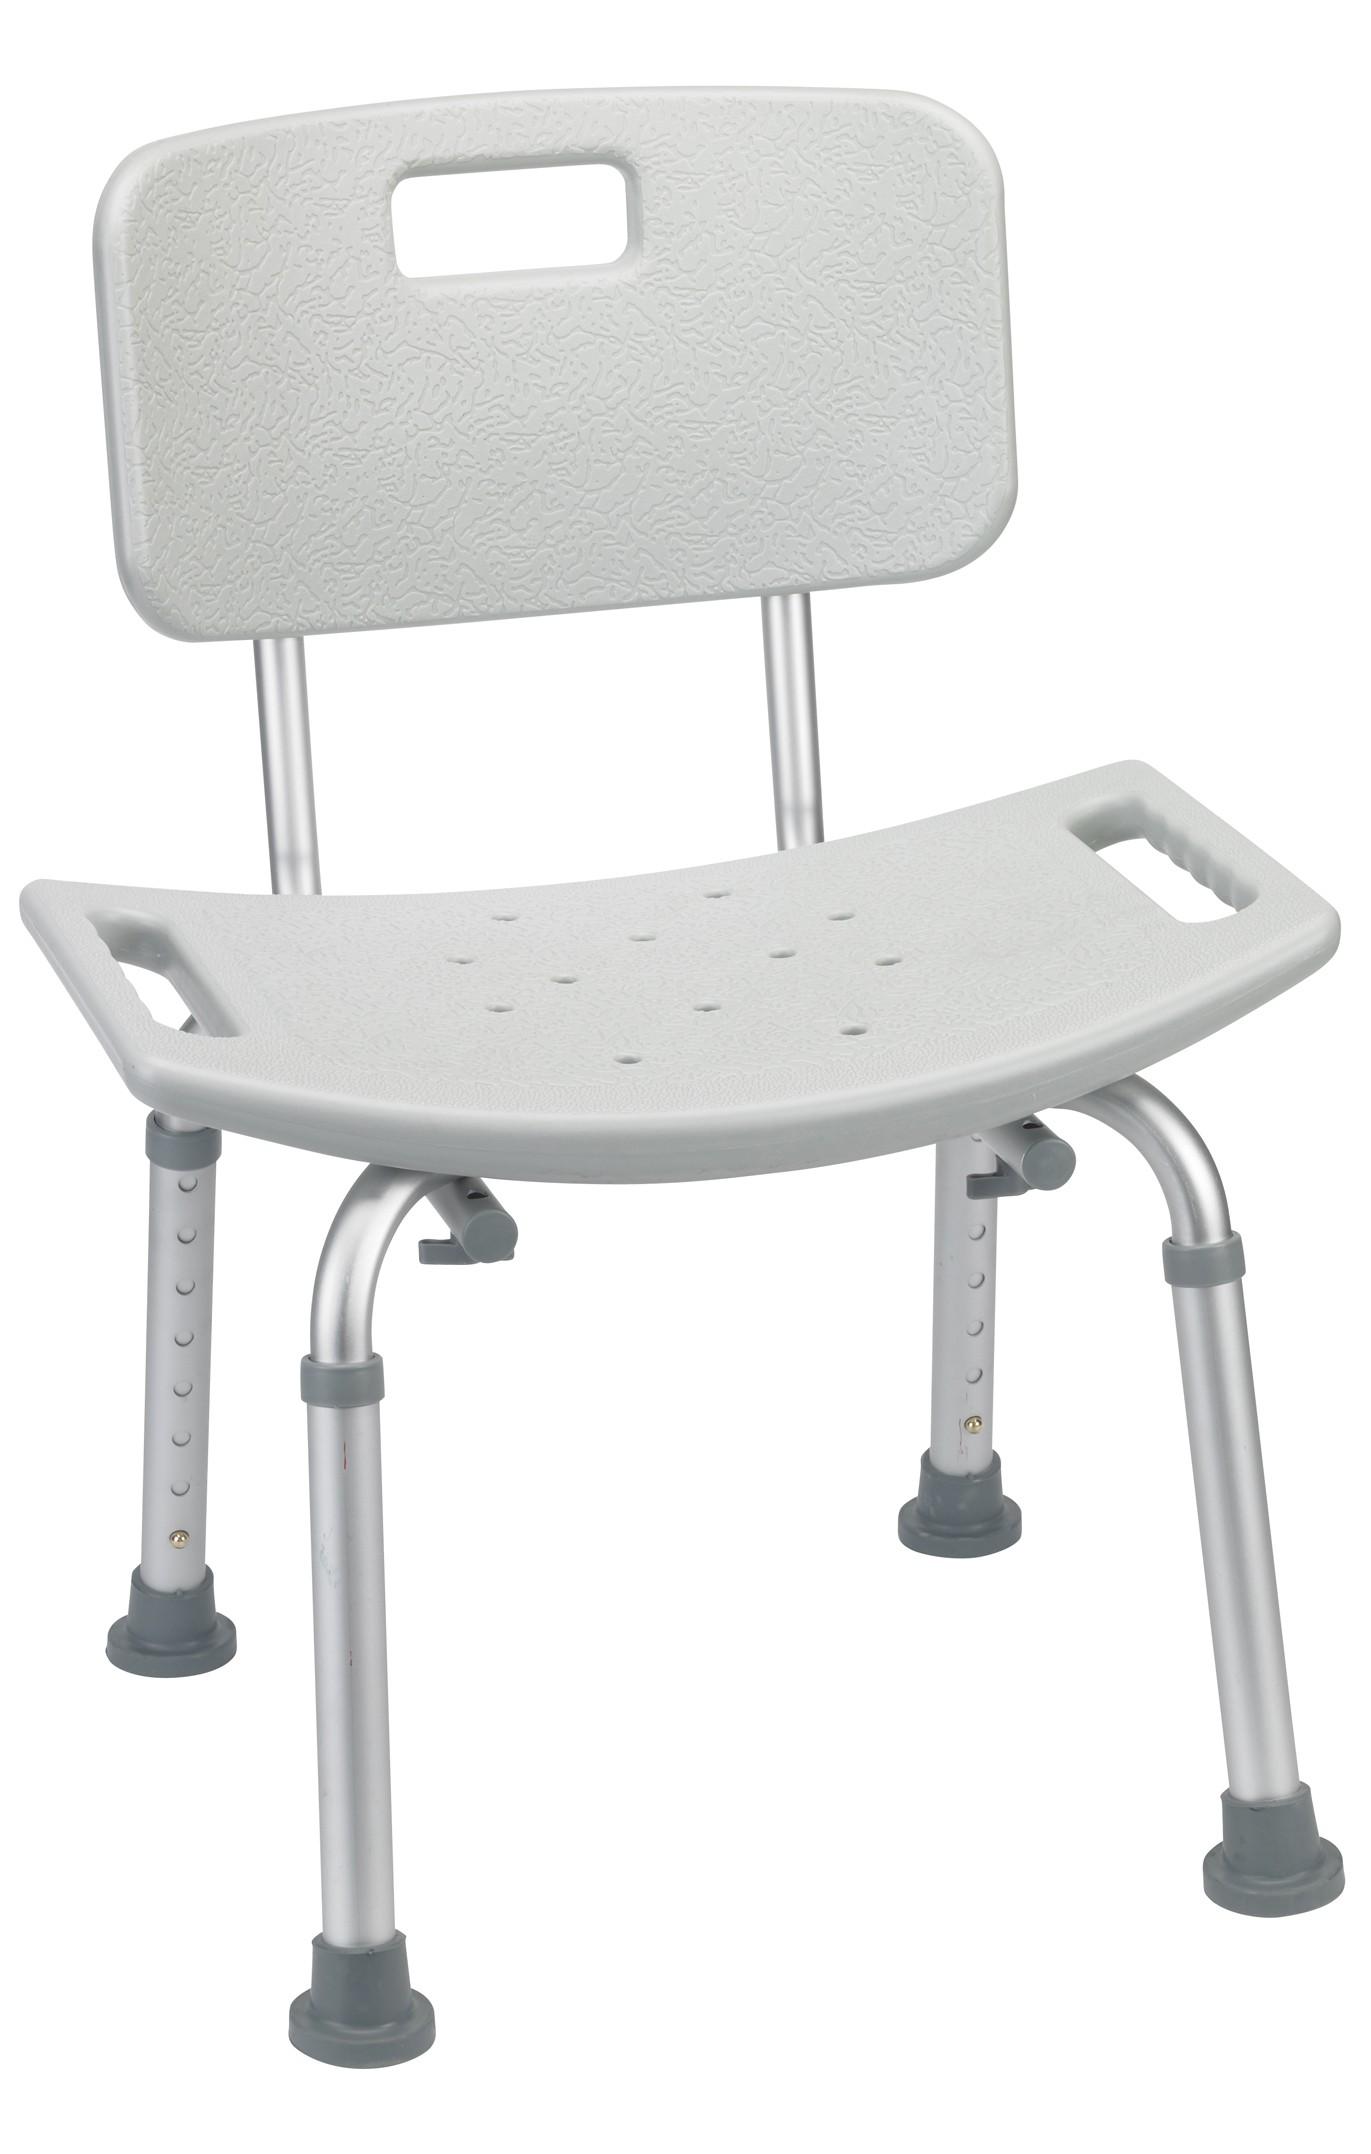 bathroom_safety_shower_tub_bench_chair.jpg